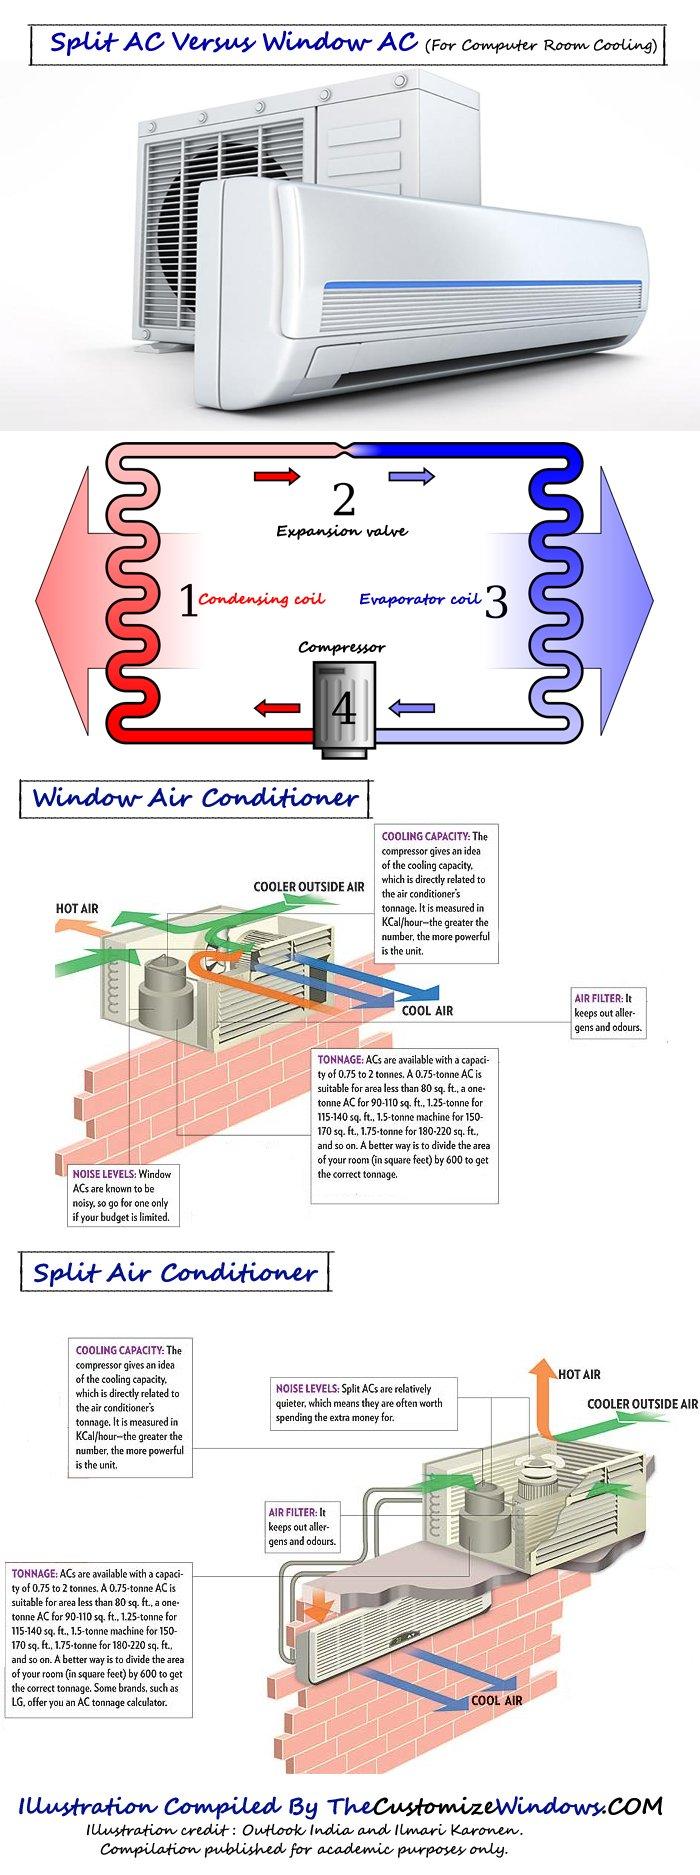 Split-AC-Versus-Window-AC-For-Computer-Room-Cooling